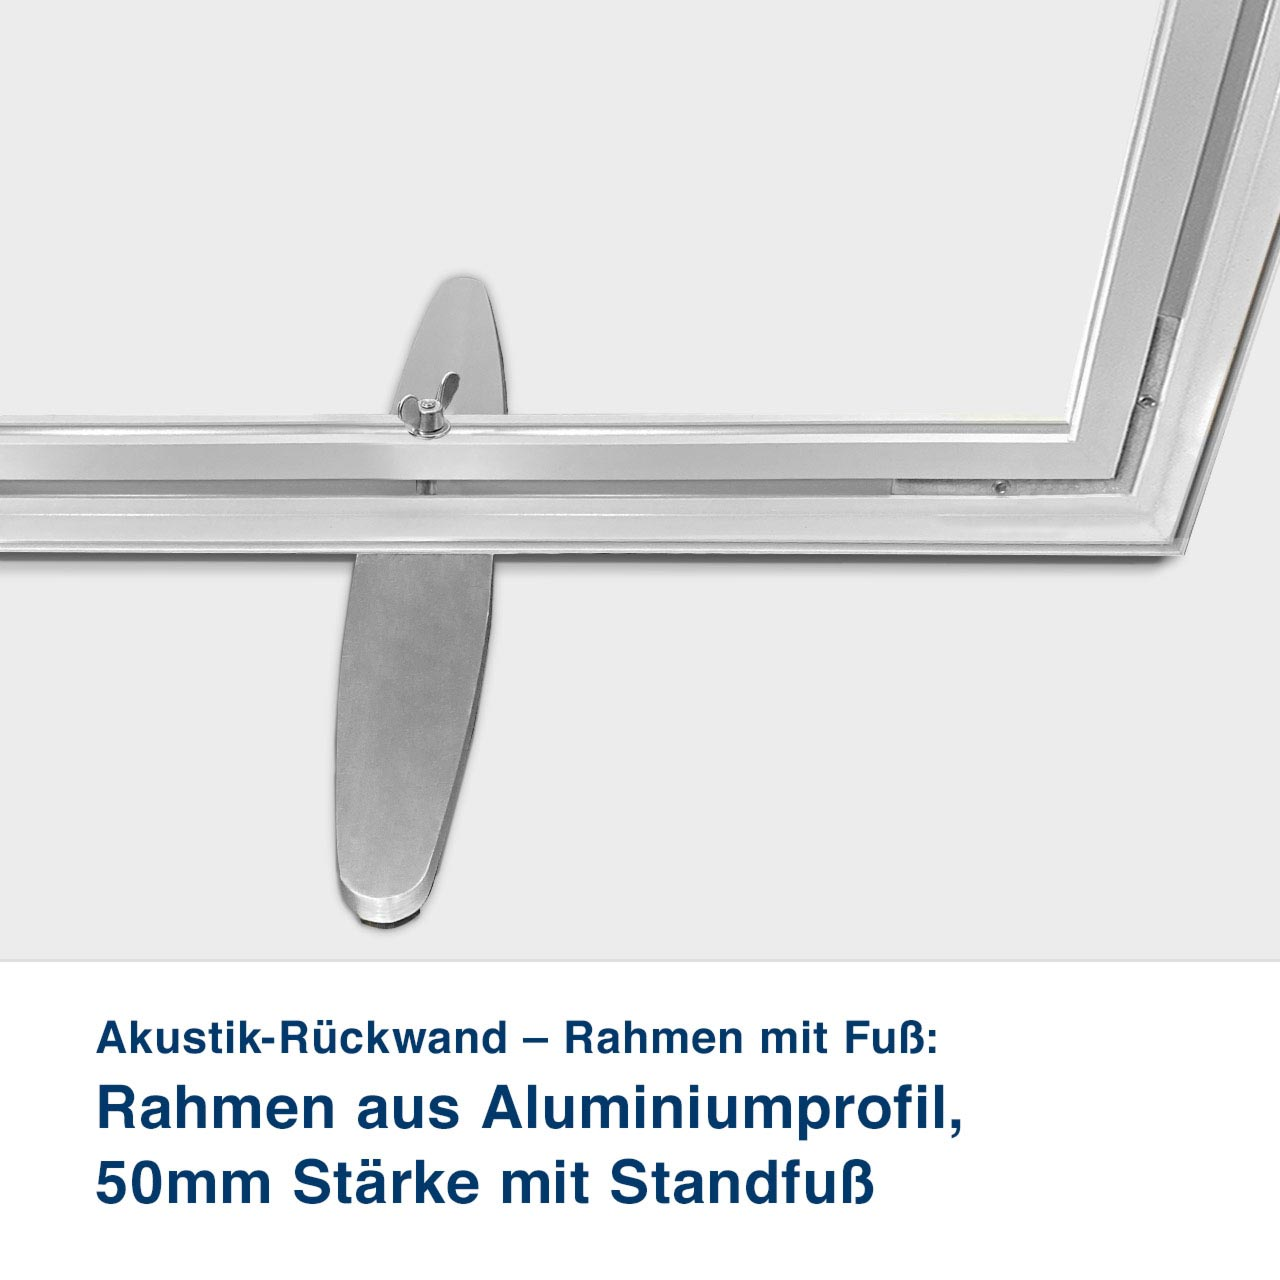 Akustik-Rückwand – Rahmen mit Fuß:   Rahmen aus Aluminiumprofil,  50mm Stärke mit Standfuß